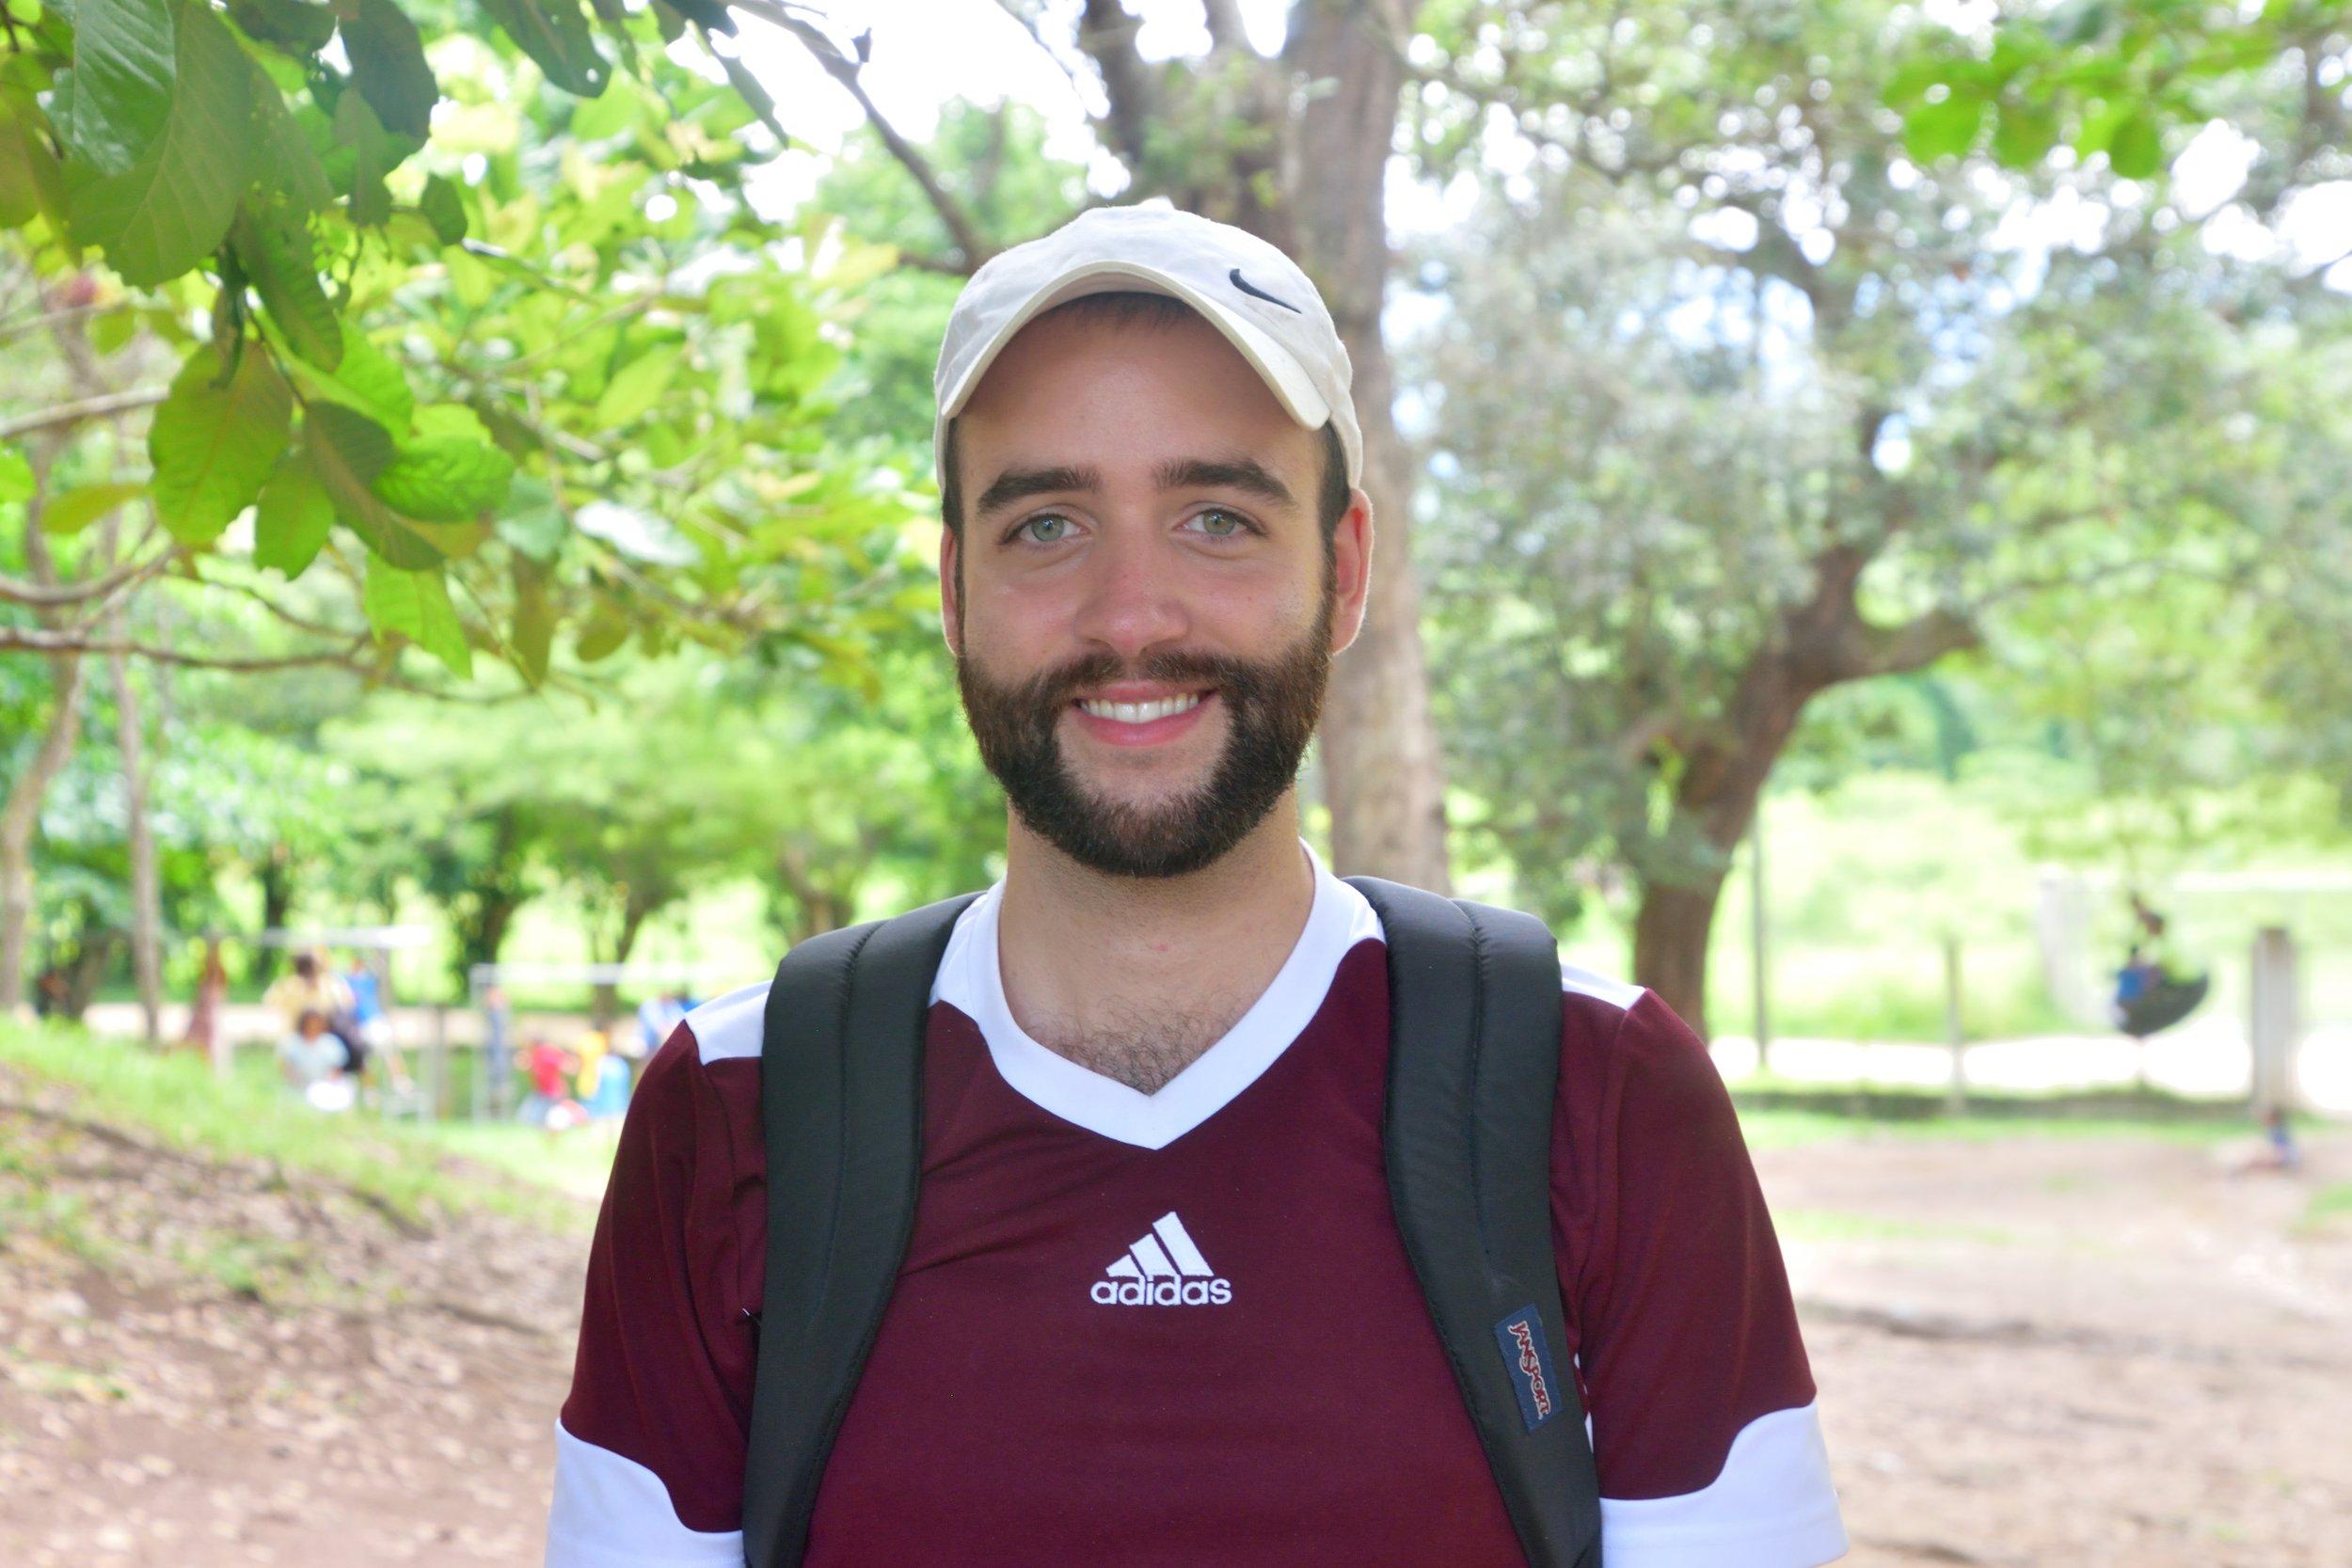 Andrew Erway, 25  Hometown:  Lebanon, PA  Current Profession:  Spanish Teacher  Role in Escuelita:  Art Instructor